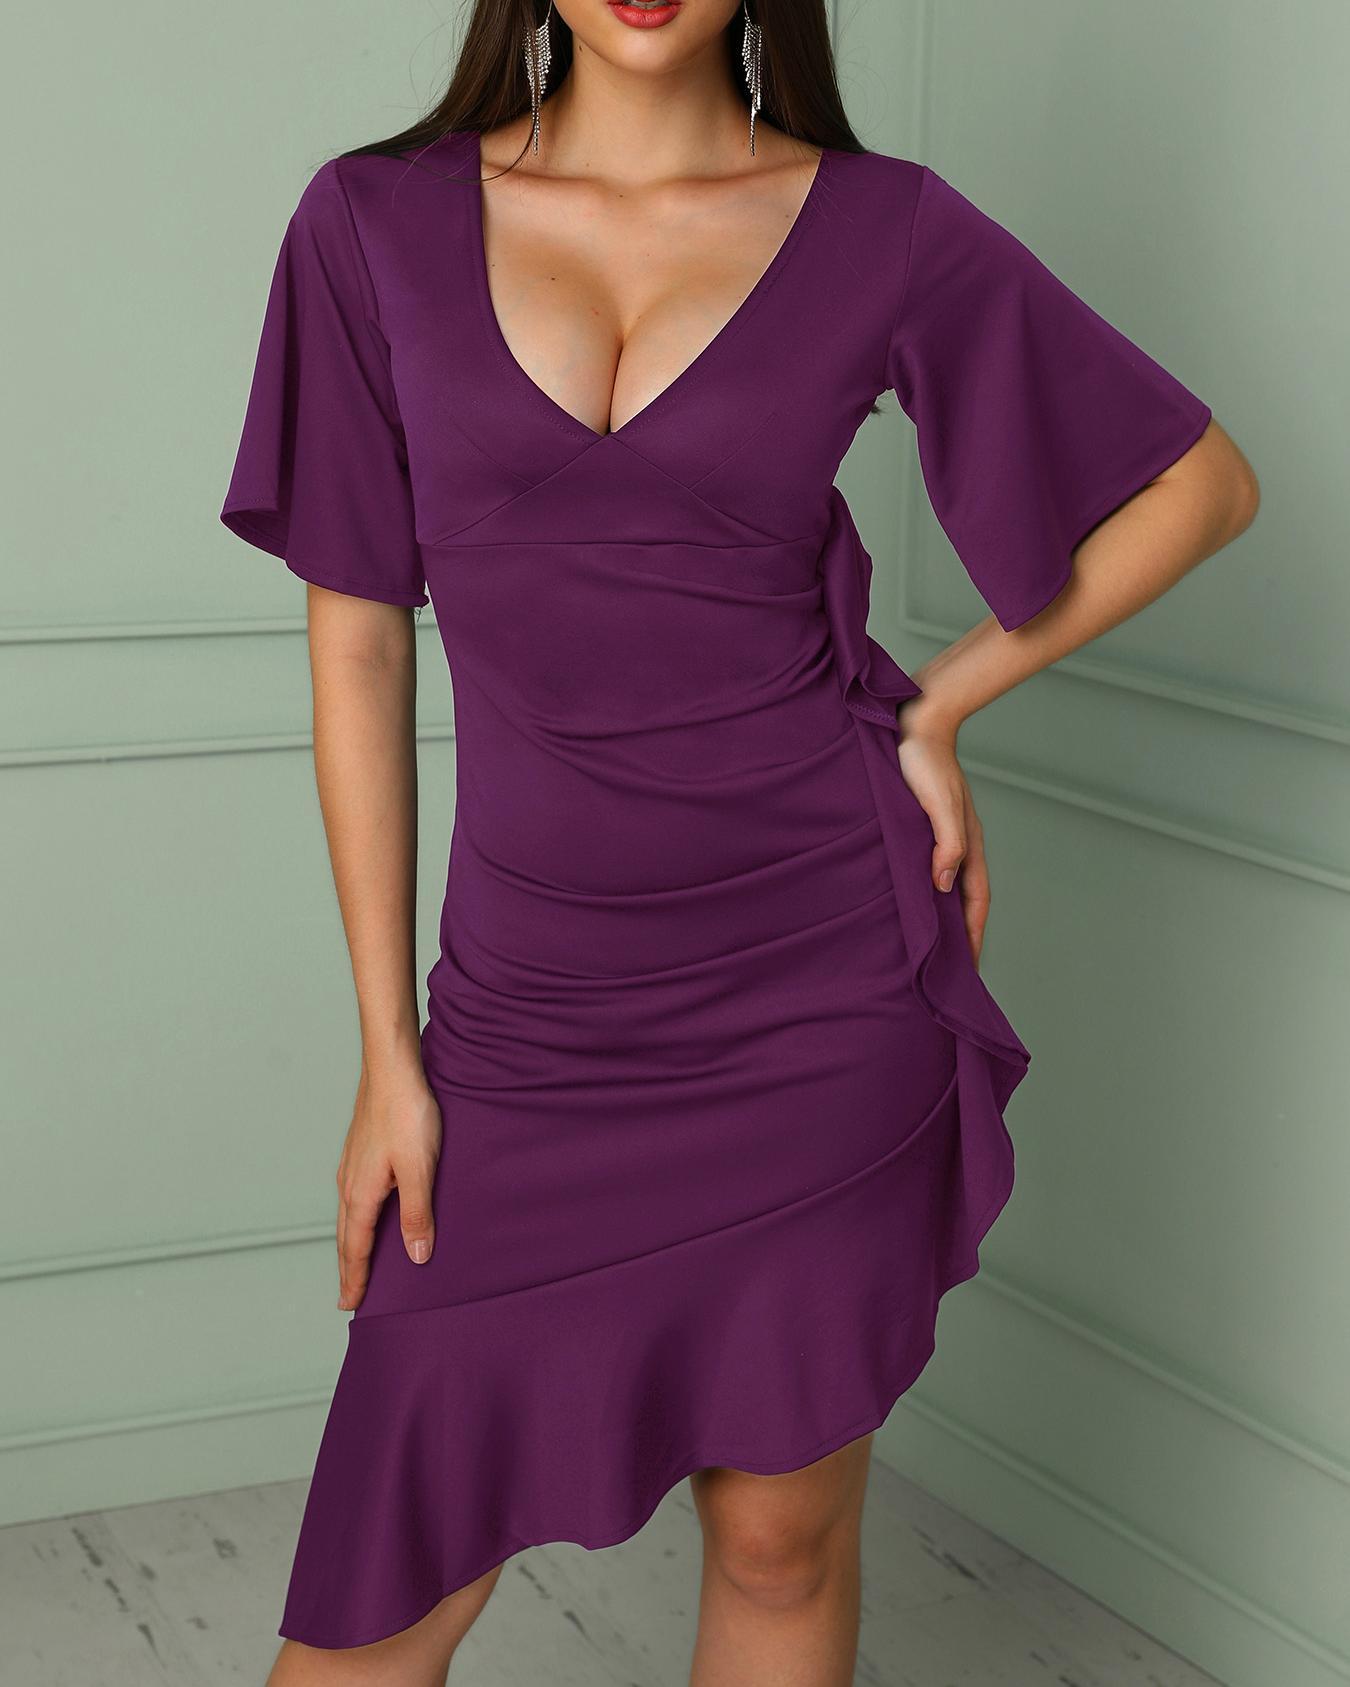 Flared Sleeve Ruffles Scrunch Design Party Dress